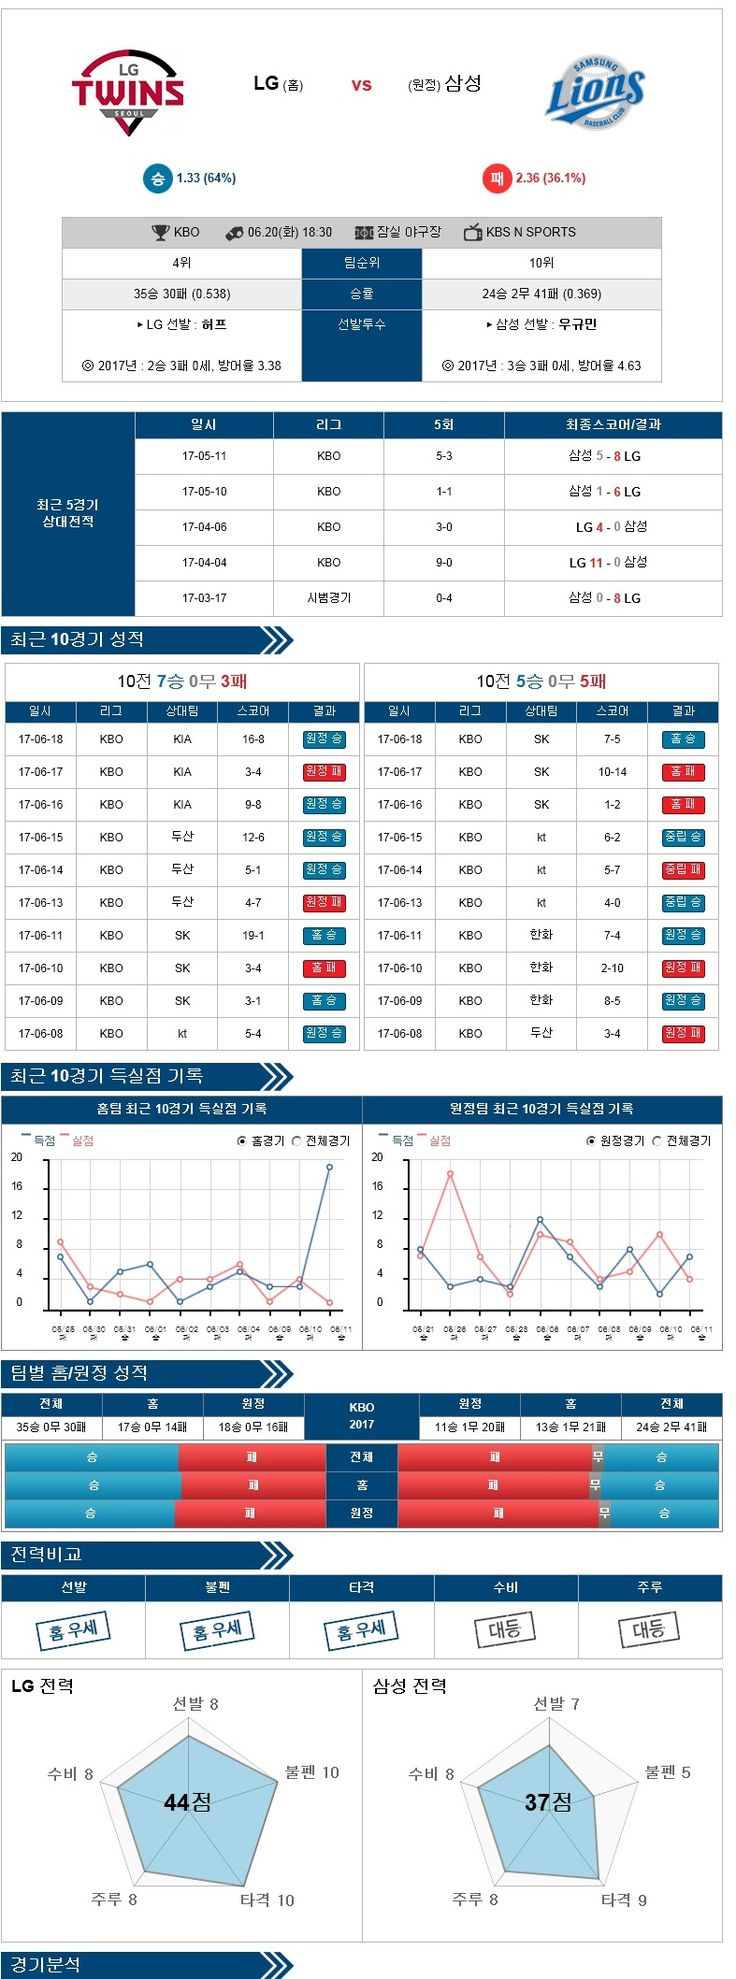 [KBO] 6월 20일 야구분석픽 LG vs 삼성 ★토토군 분석★